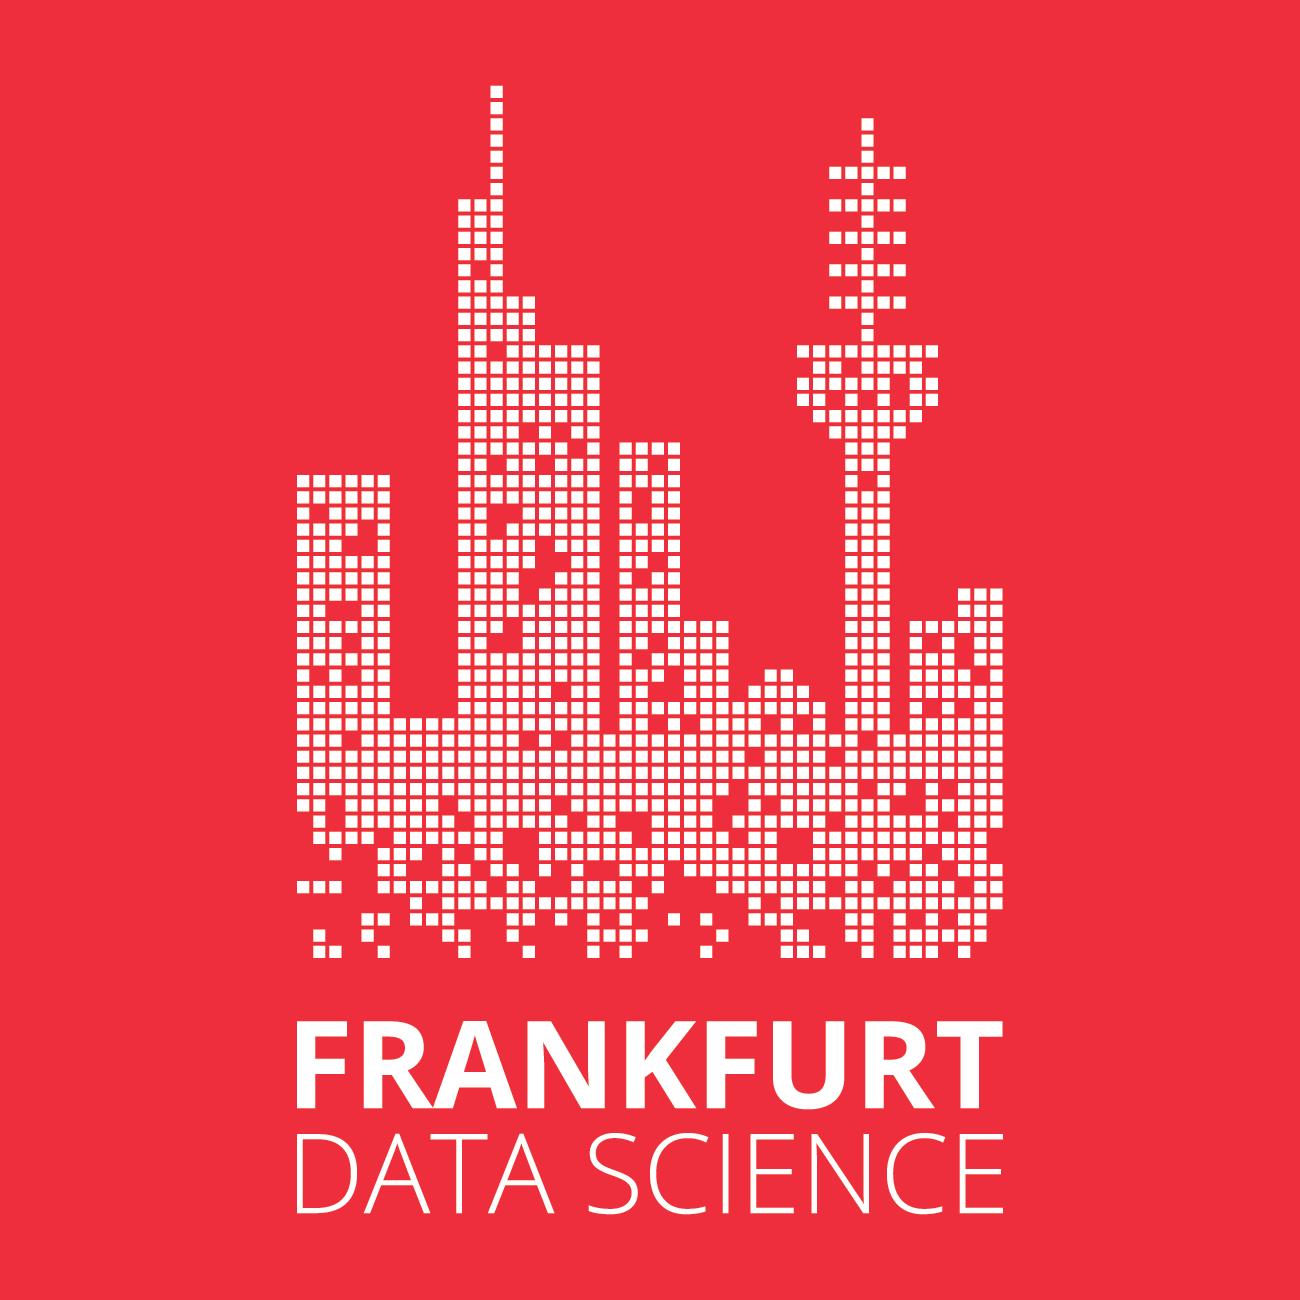 frankfurt_data_science_meetup_logo_red